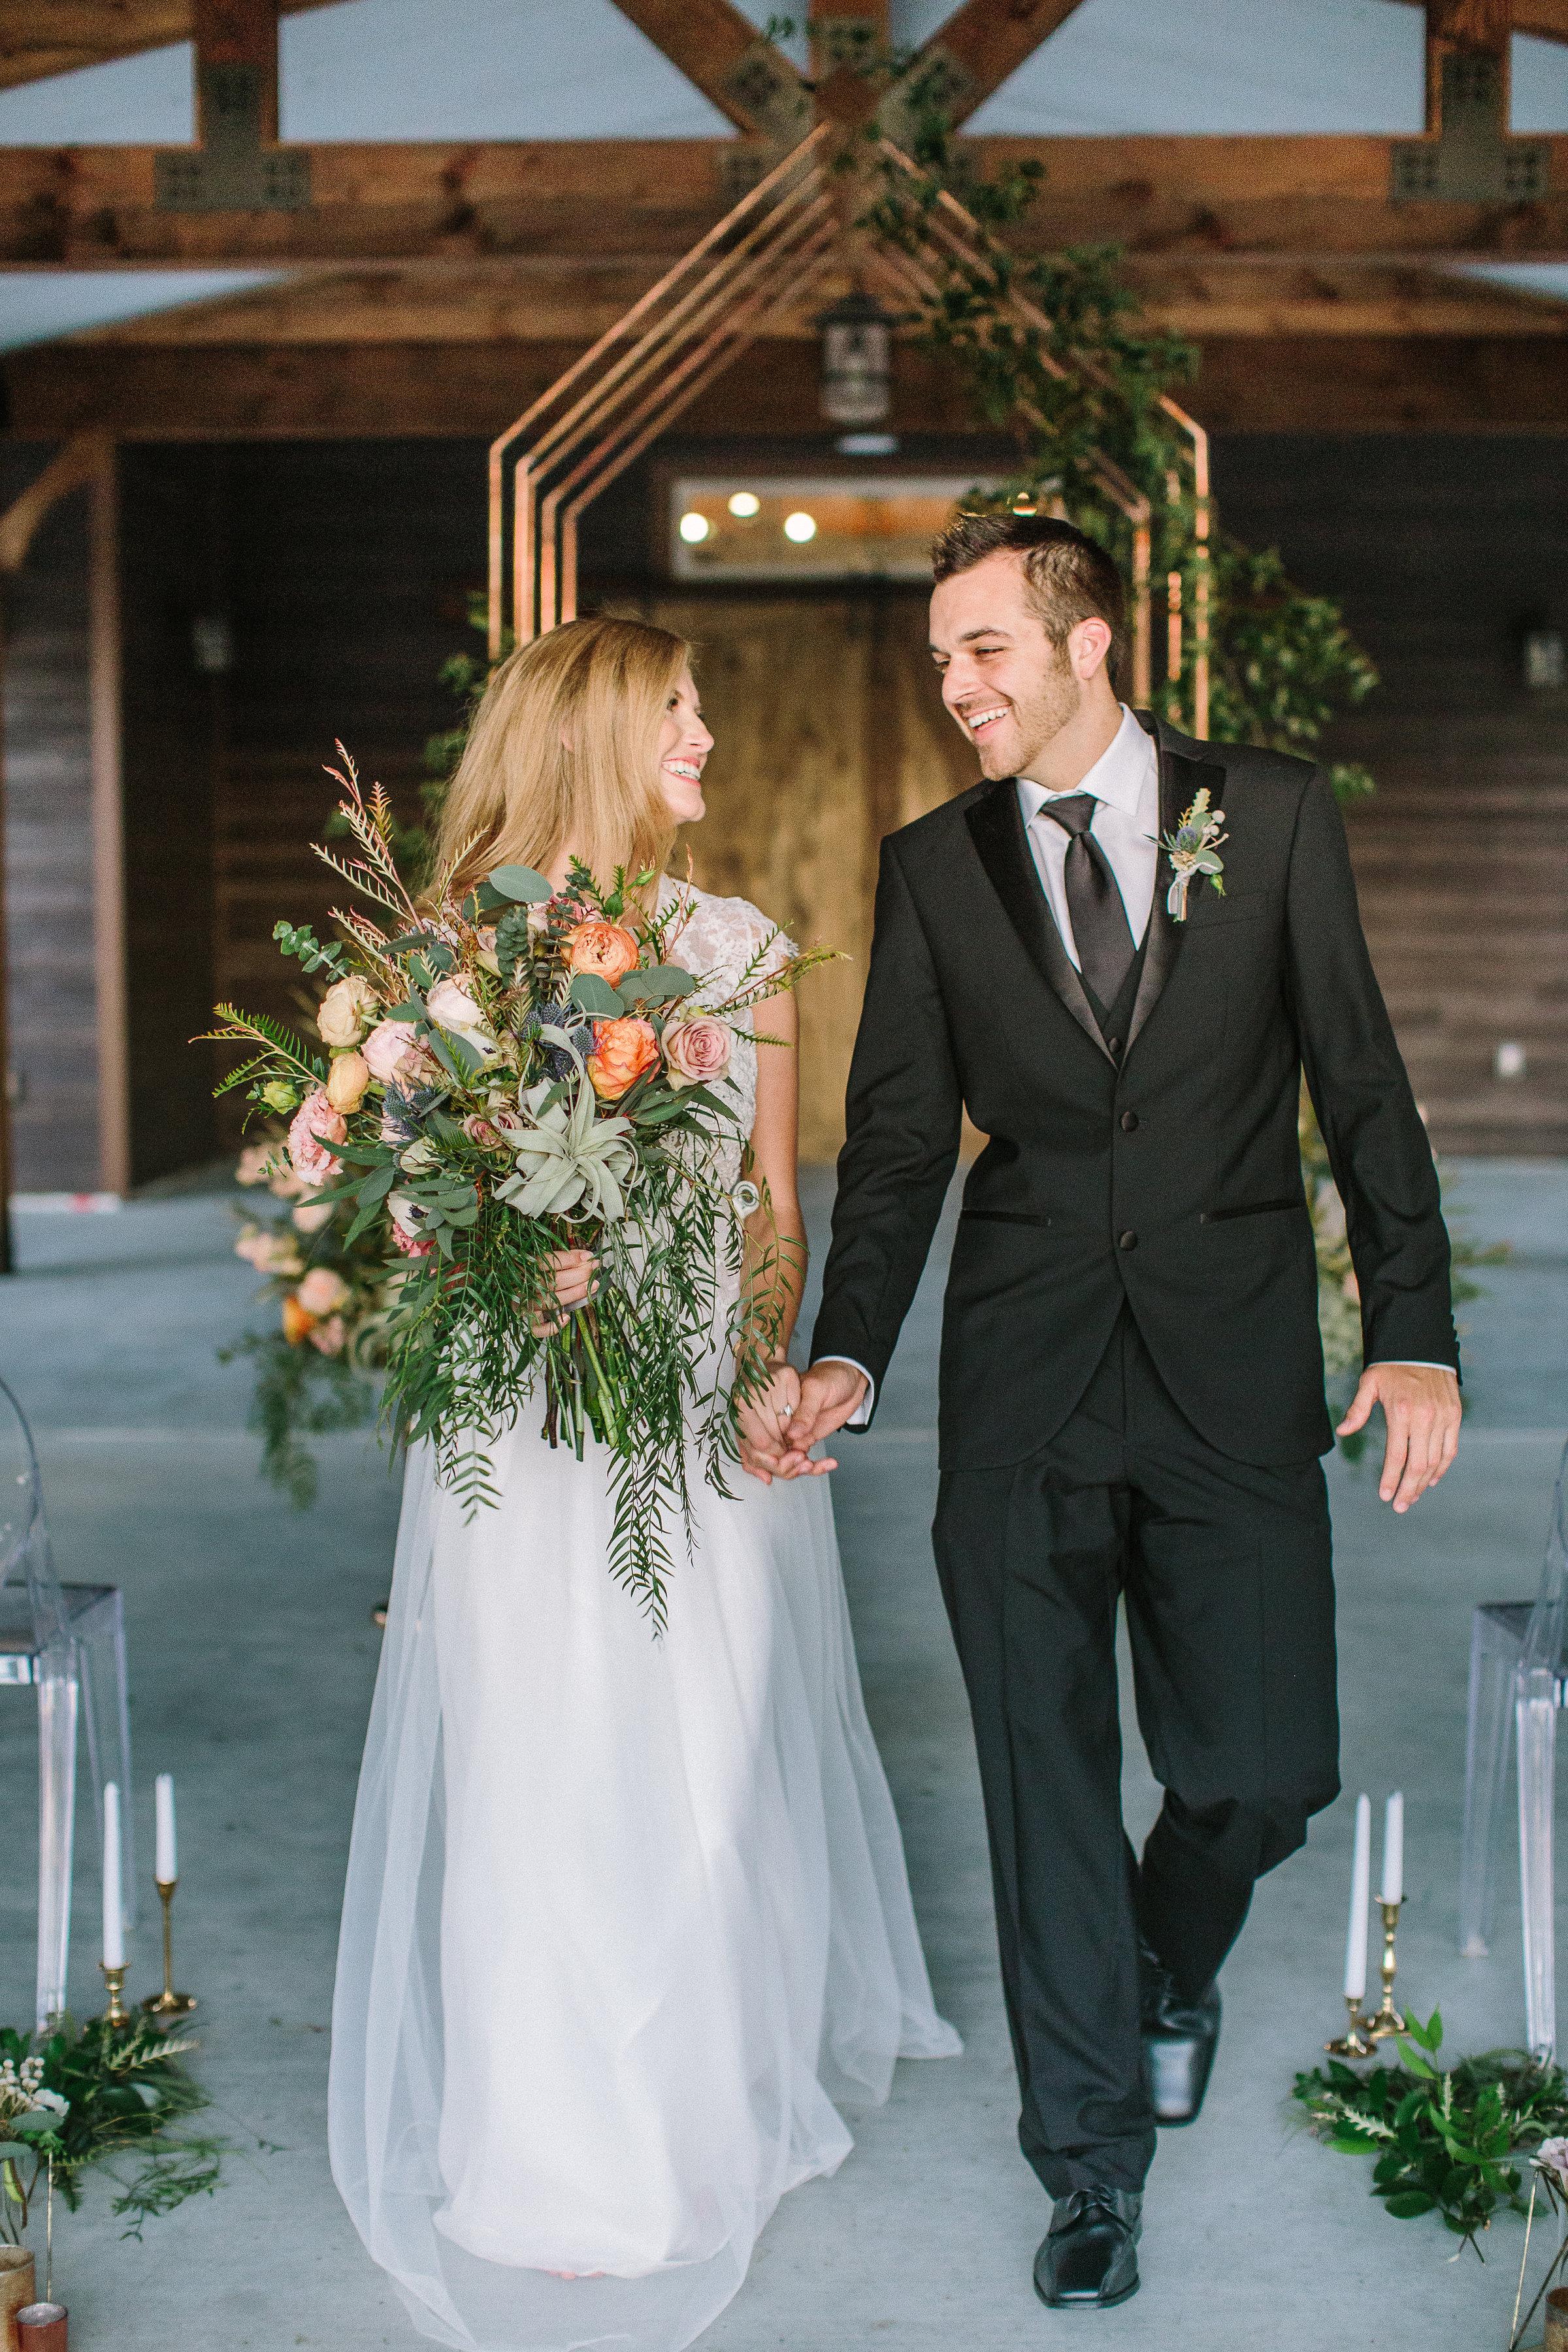 Ellen-Ashton-Photography-Peach-Creek-Ranch-Weddings-Wed-and-Prosper384